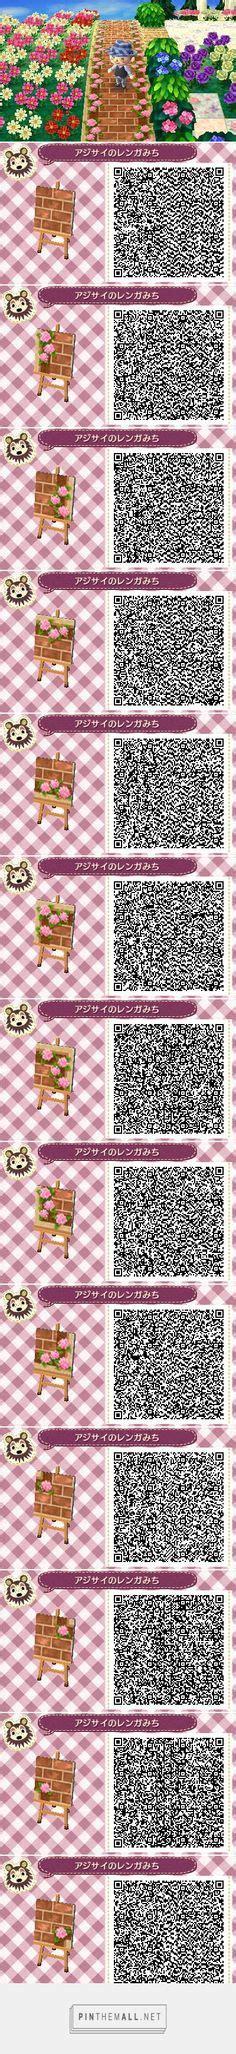 pink pattern acnl photo album imgur beautiful gray brick pattern qr